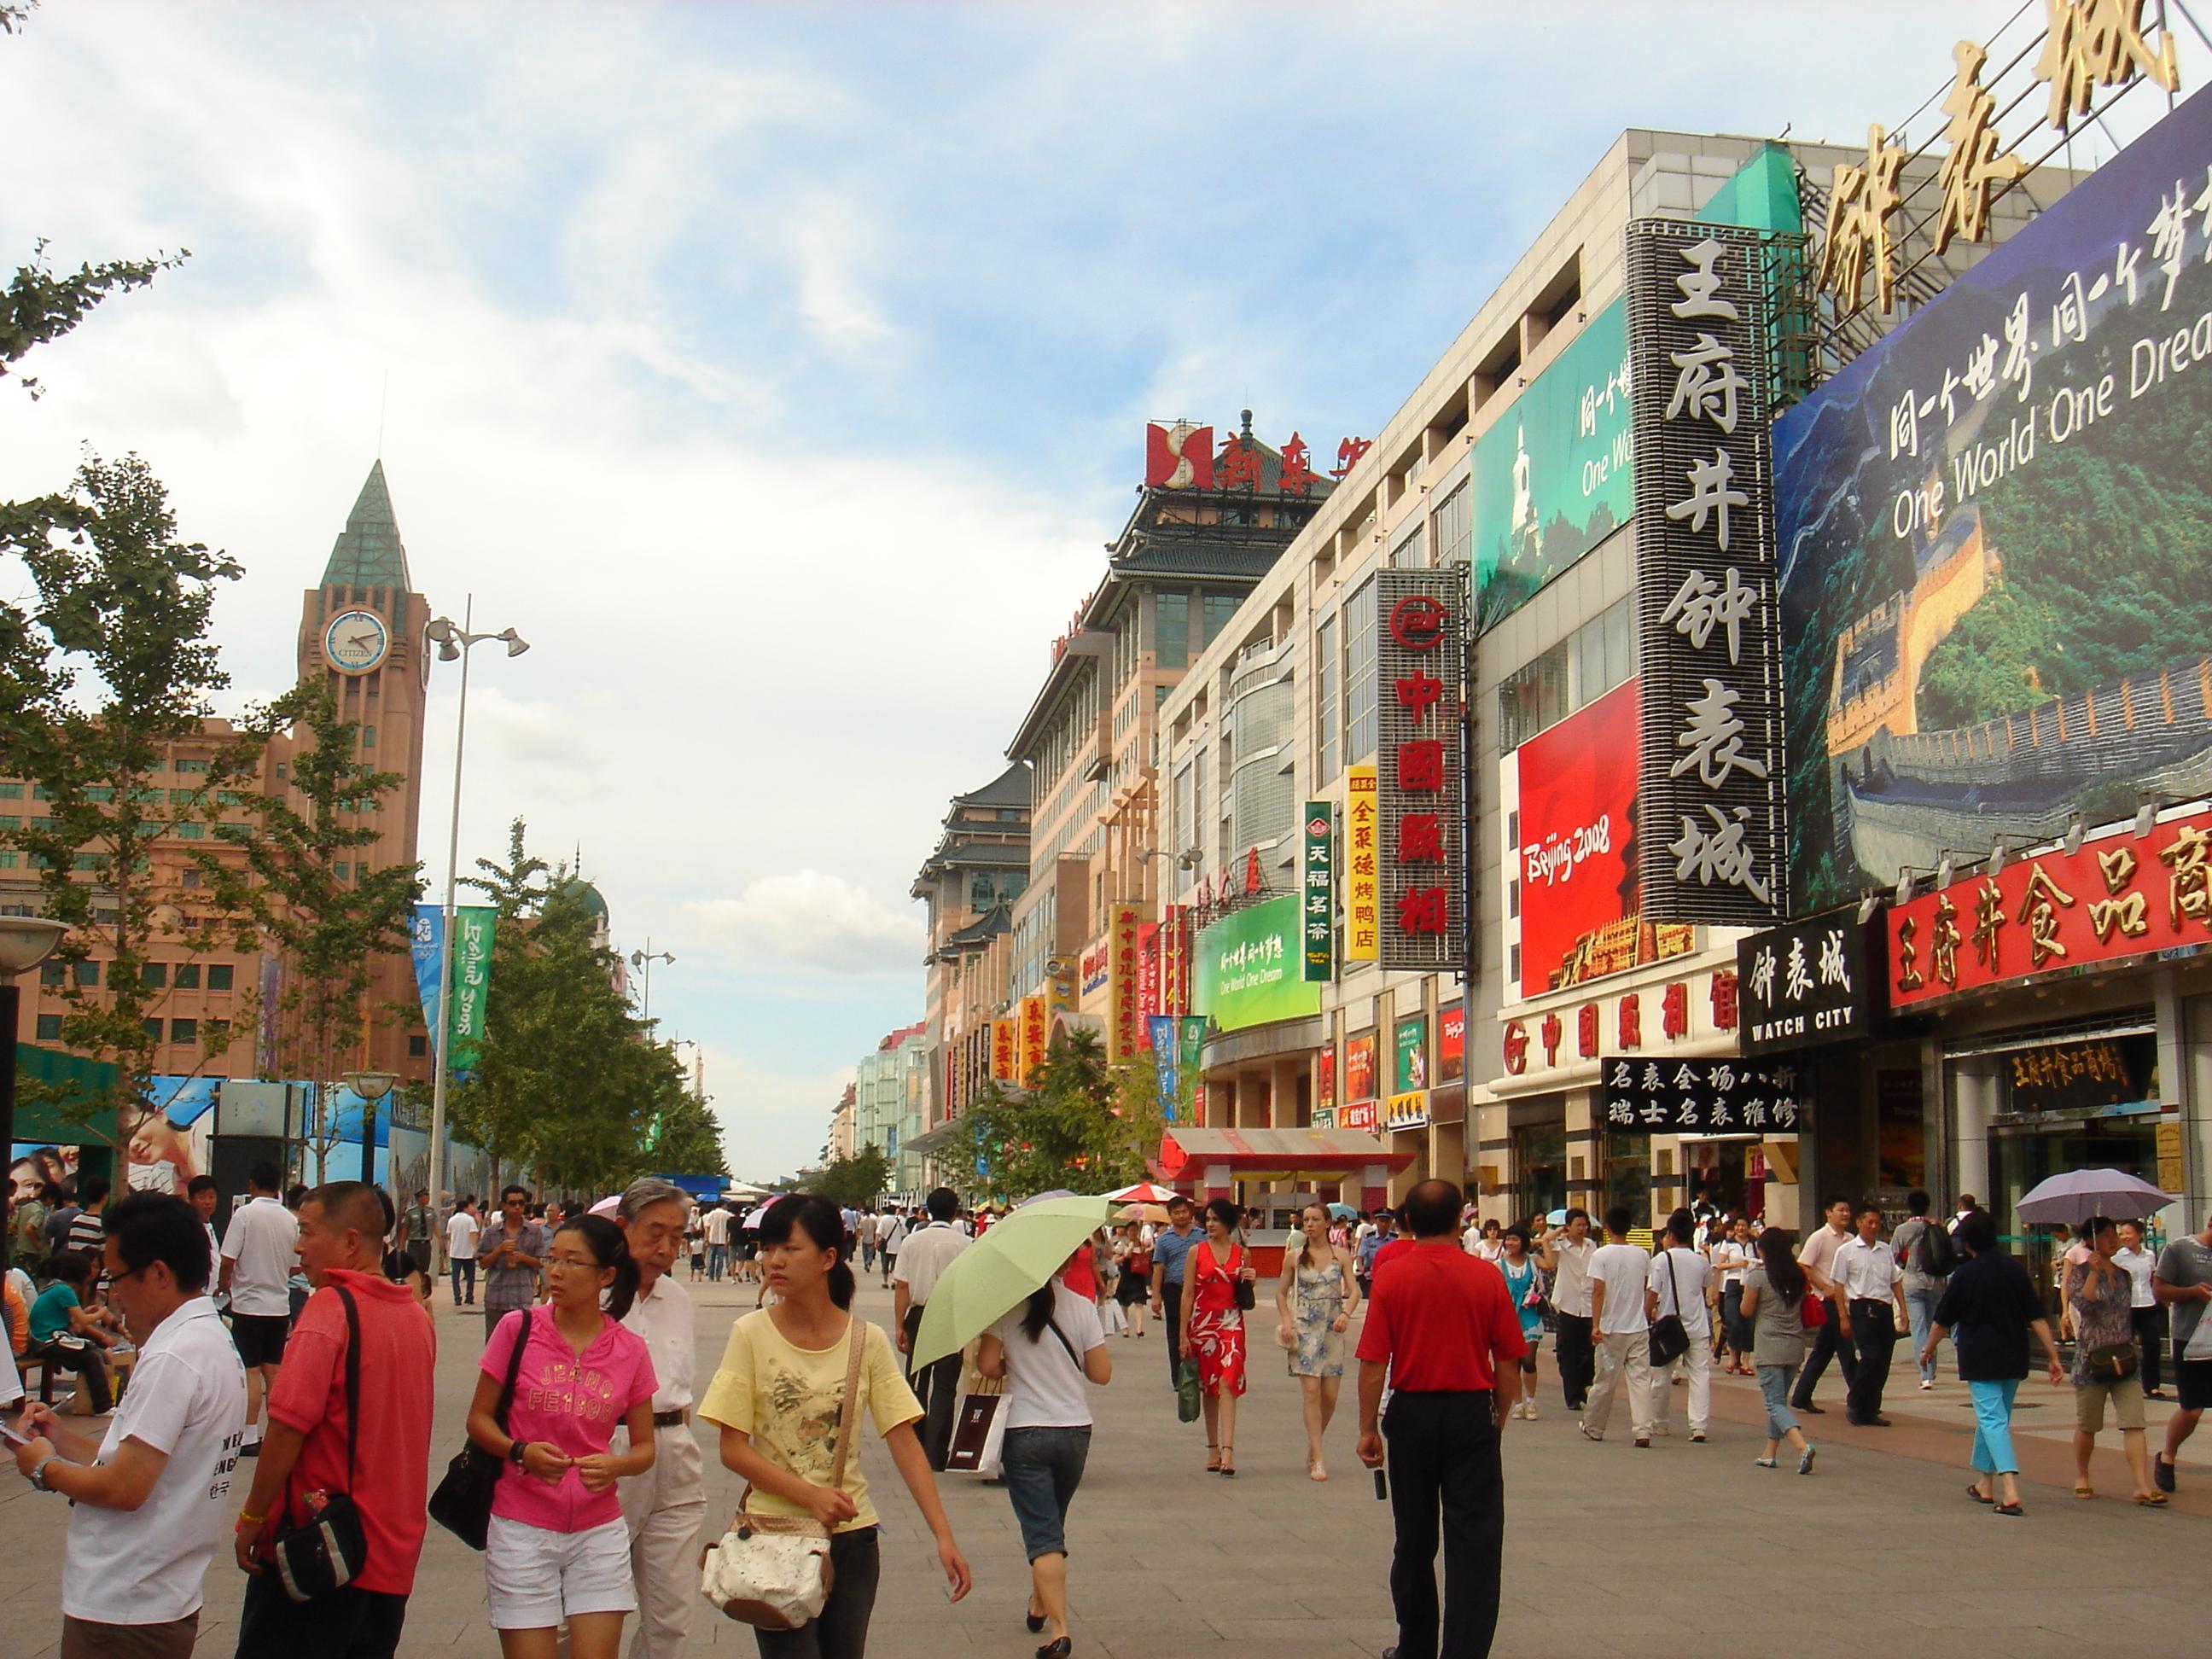 Summer olympics 2022 beijing bid for the 2022